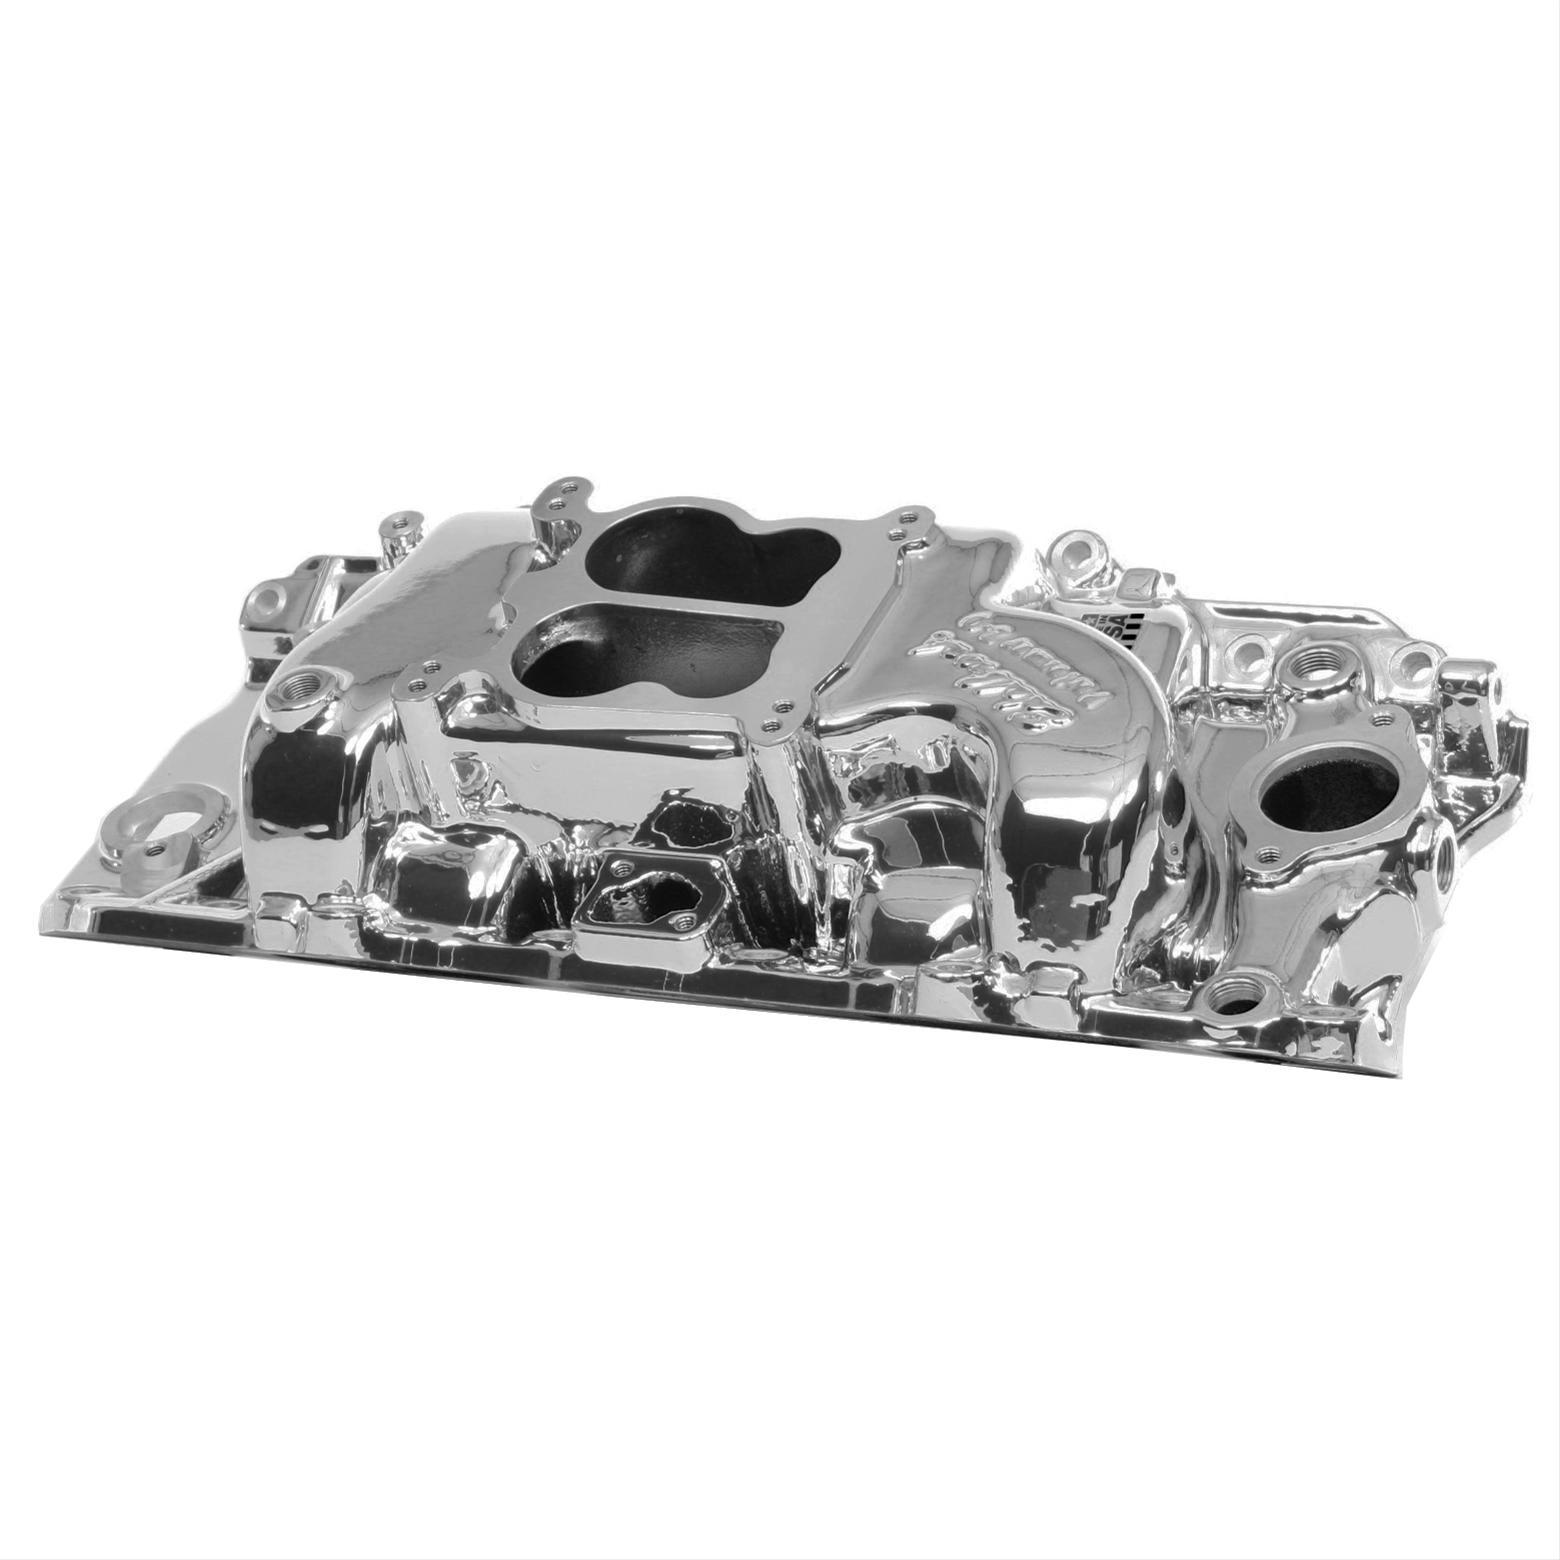 Edelbrock Performer Intake Manold Chevy B396 427 454 Fits